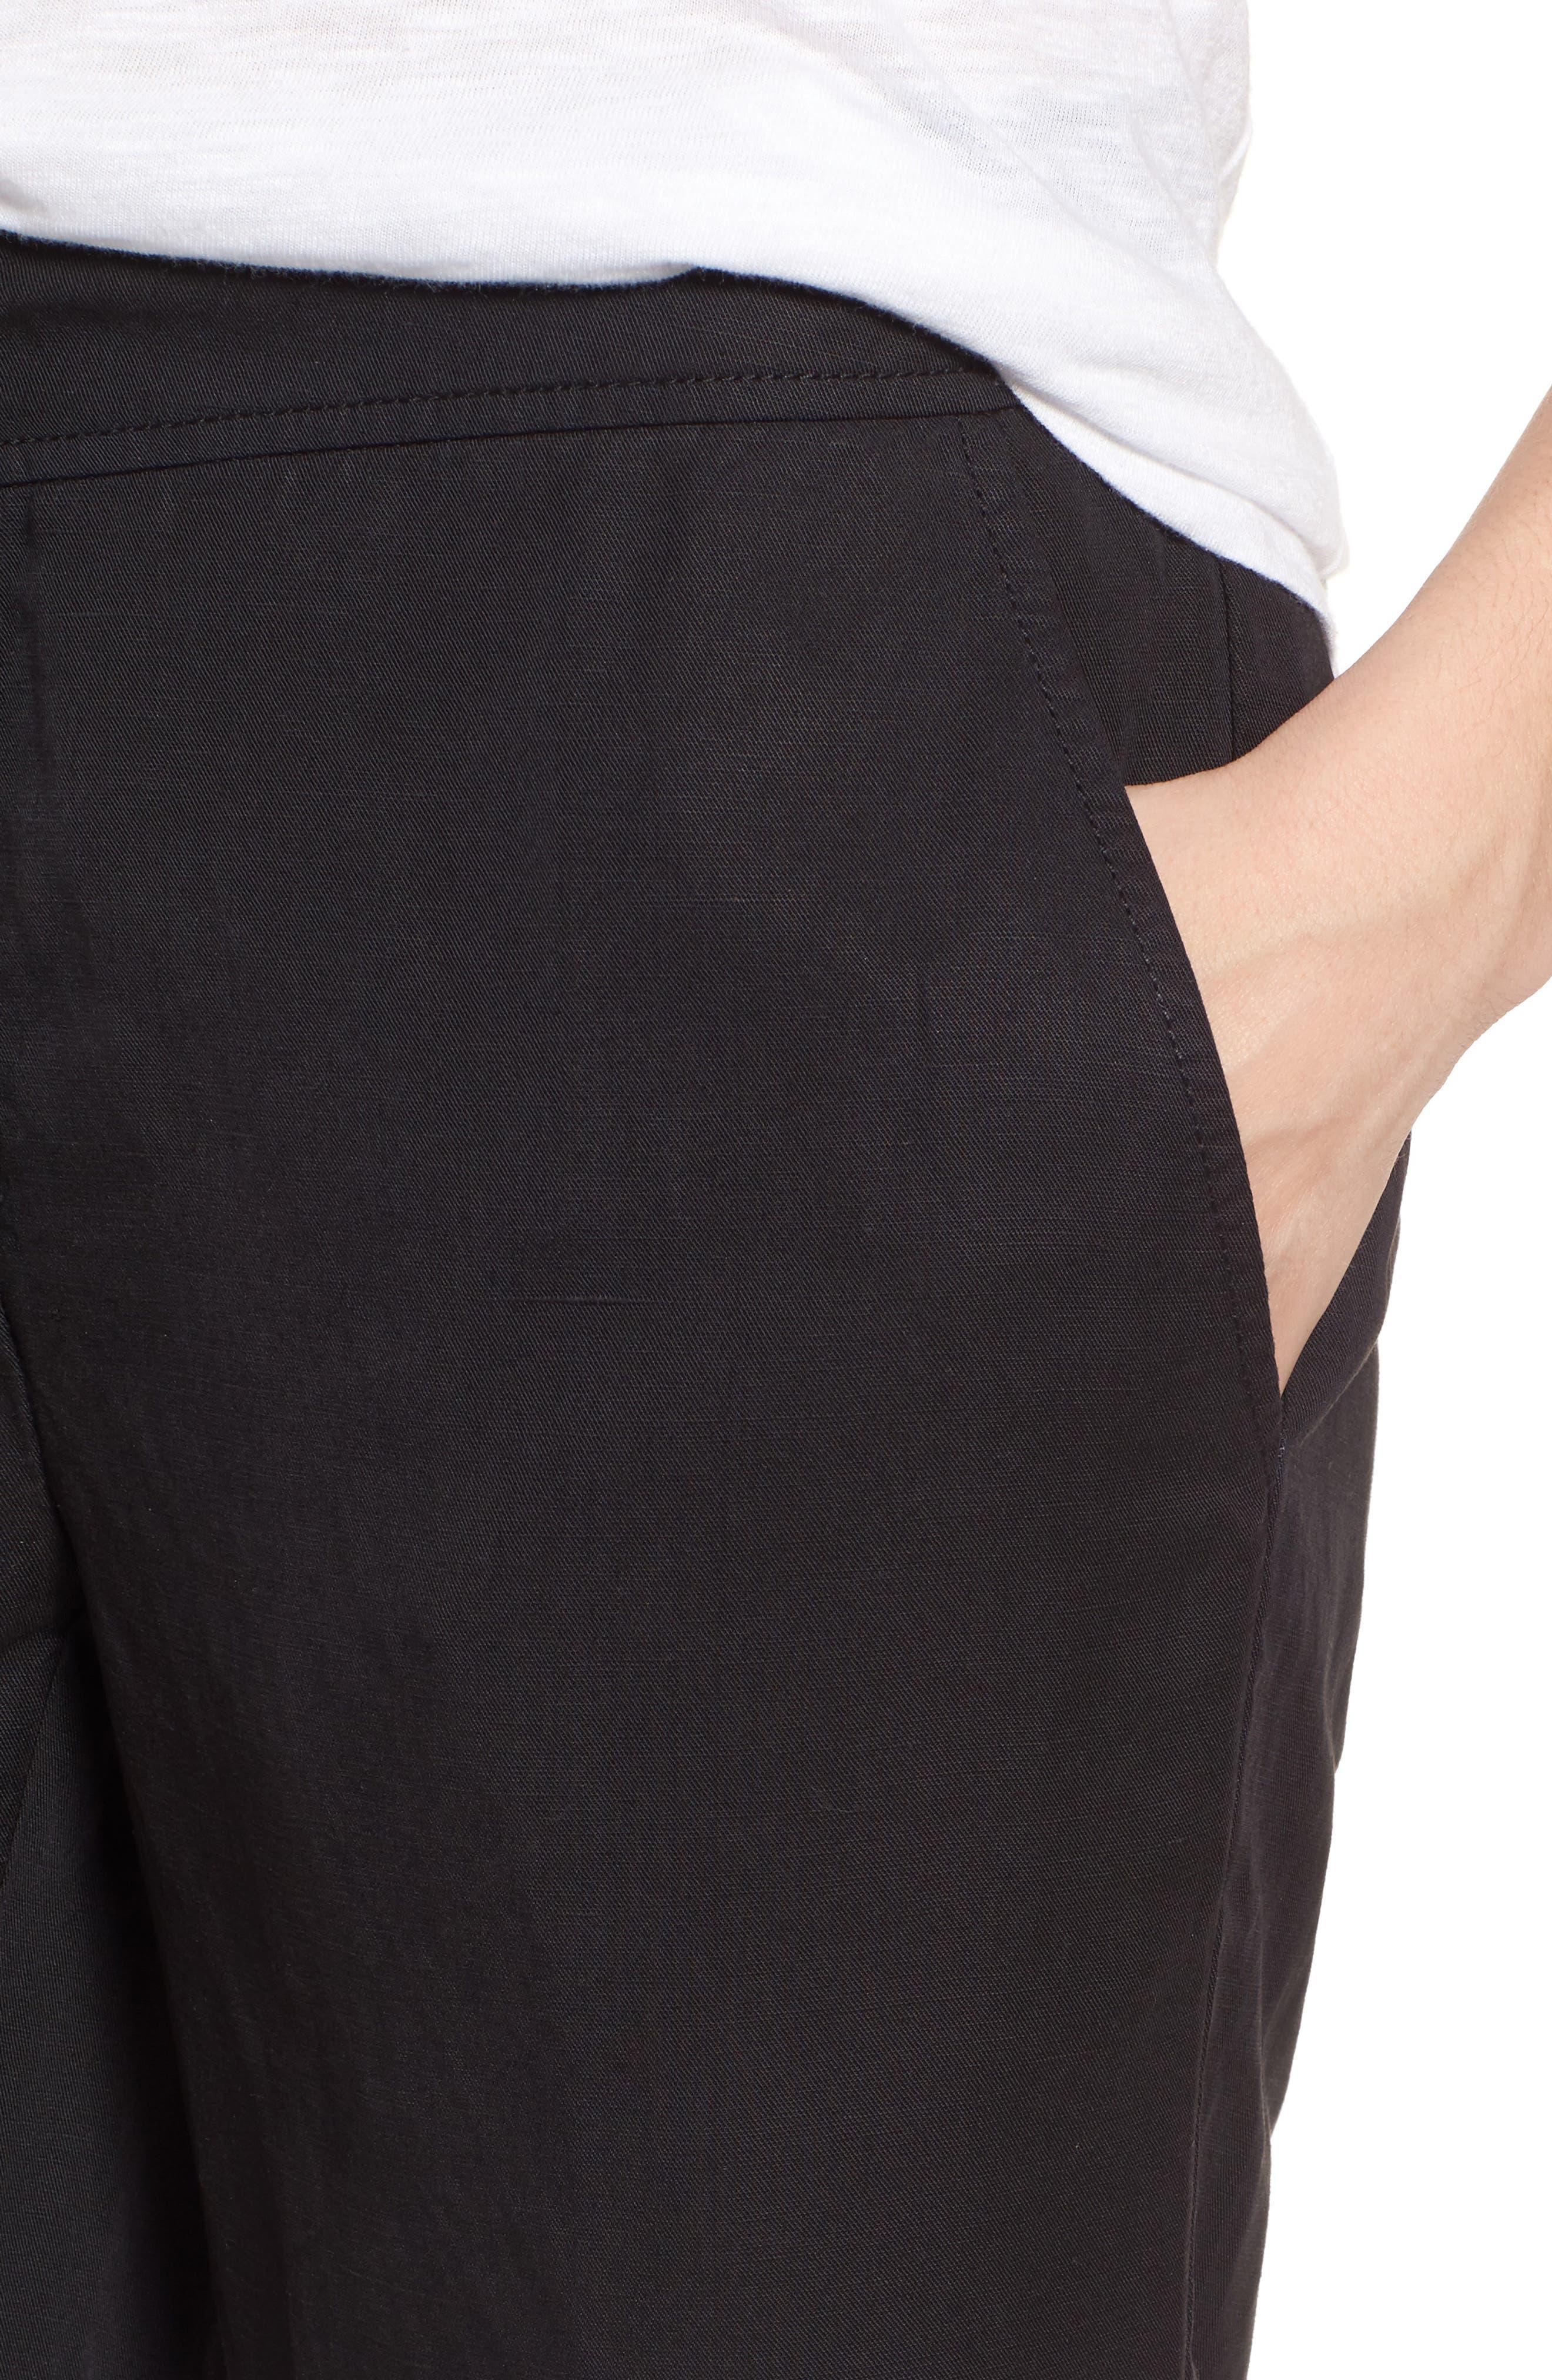 Tencel<sup>®</sup> Lyocell & Linen Walking Shorts,                             Alternate thumbnail 4, color,                             Black